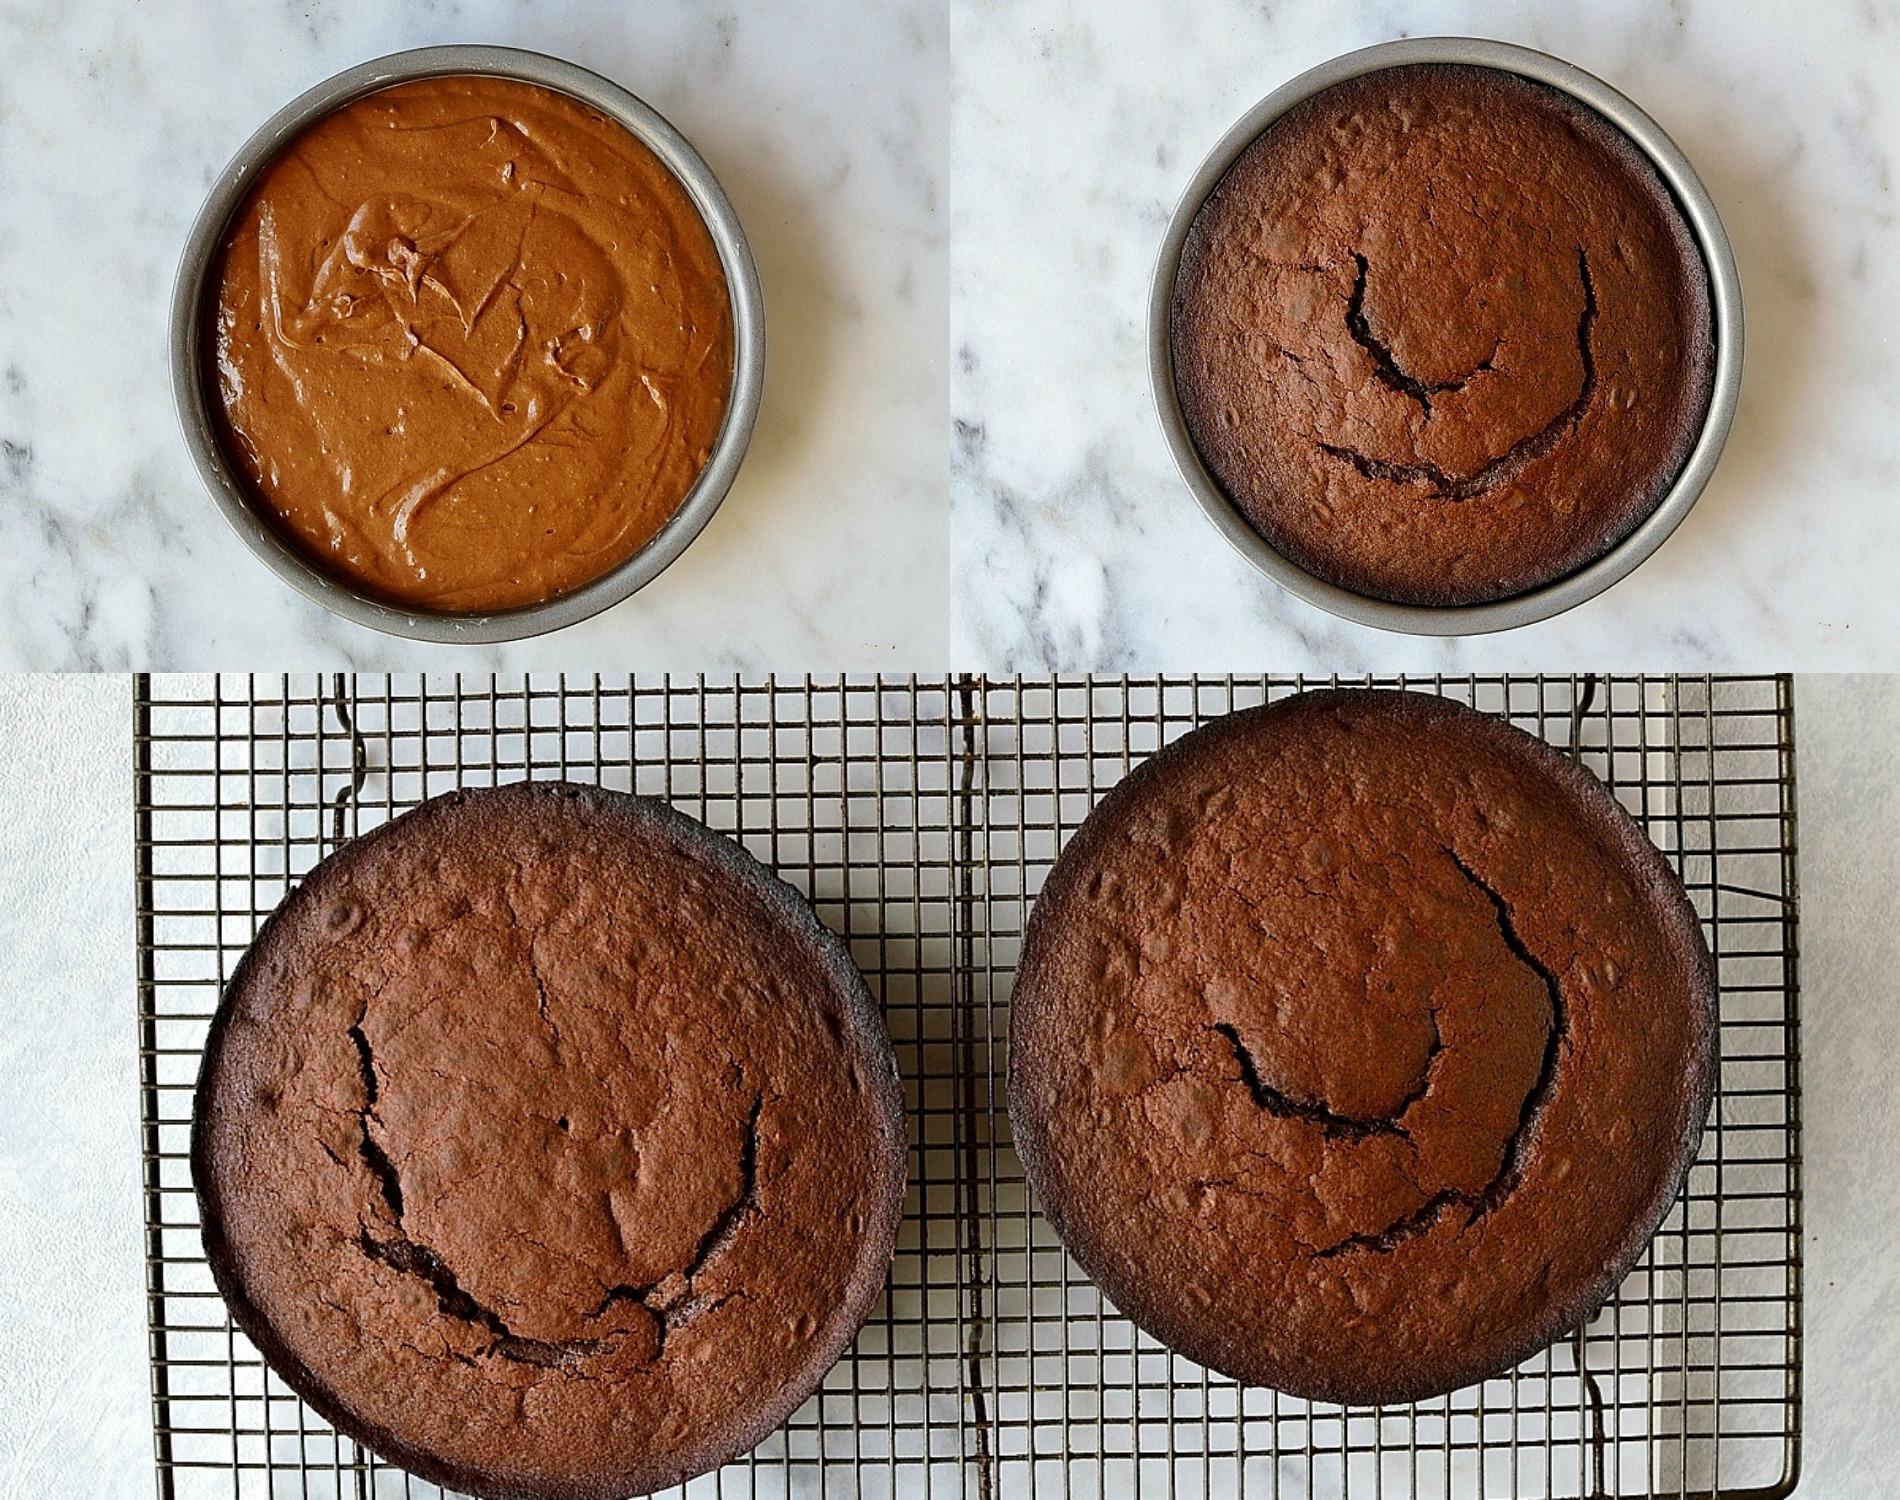 Ultimate chocolate cake steps 5